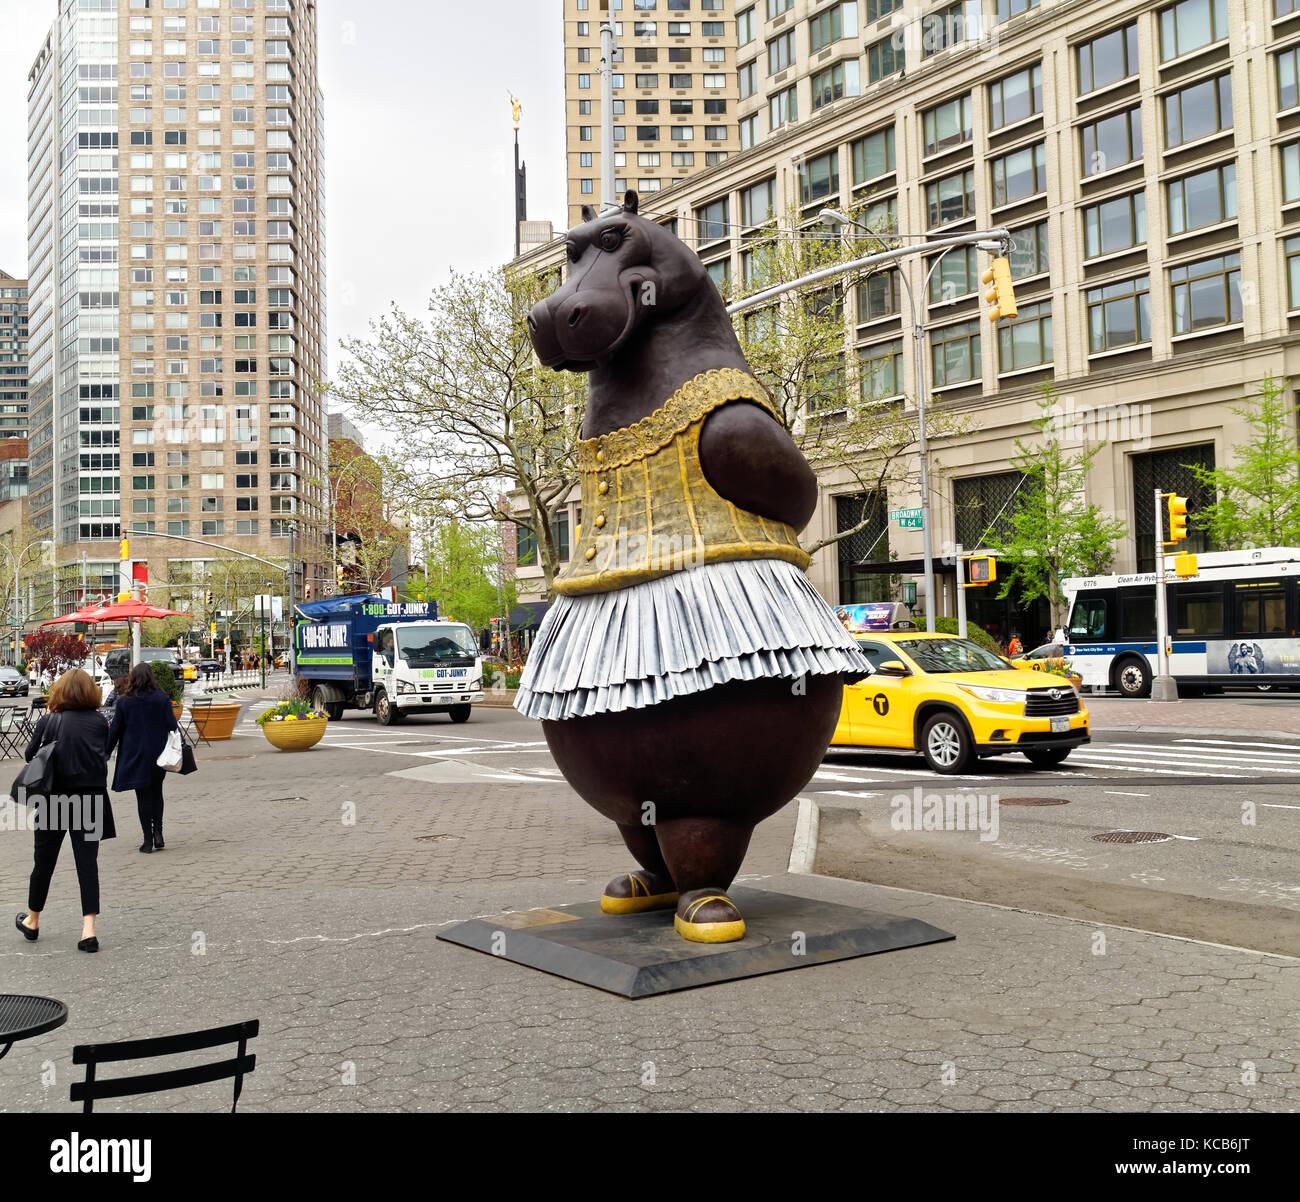 Large bronze Hippo ballerina statue at Lincoln Center by artist Bjørn Ekholm Skaarup, inspired by the Disney's - Stock Image